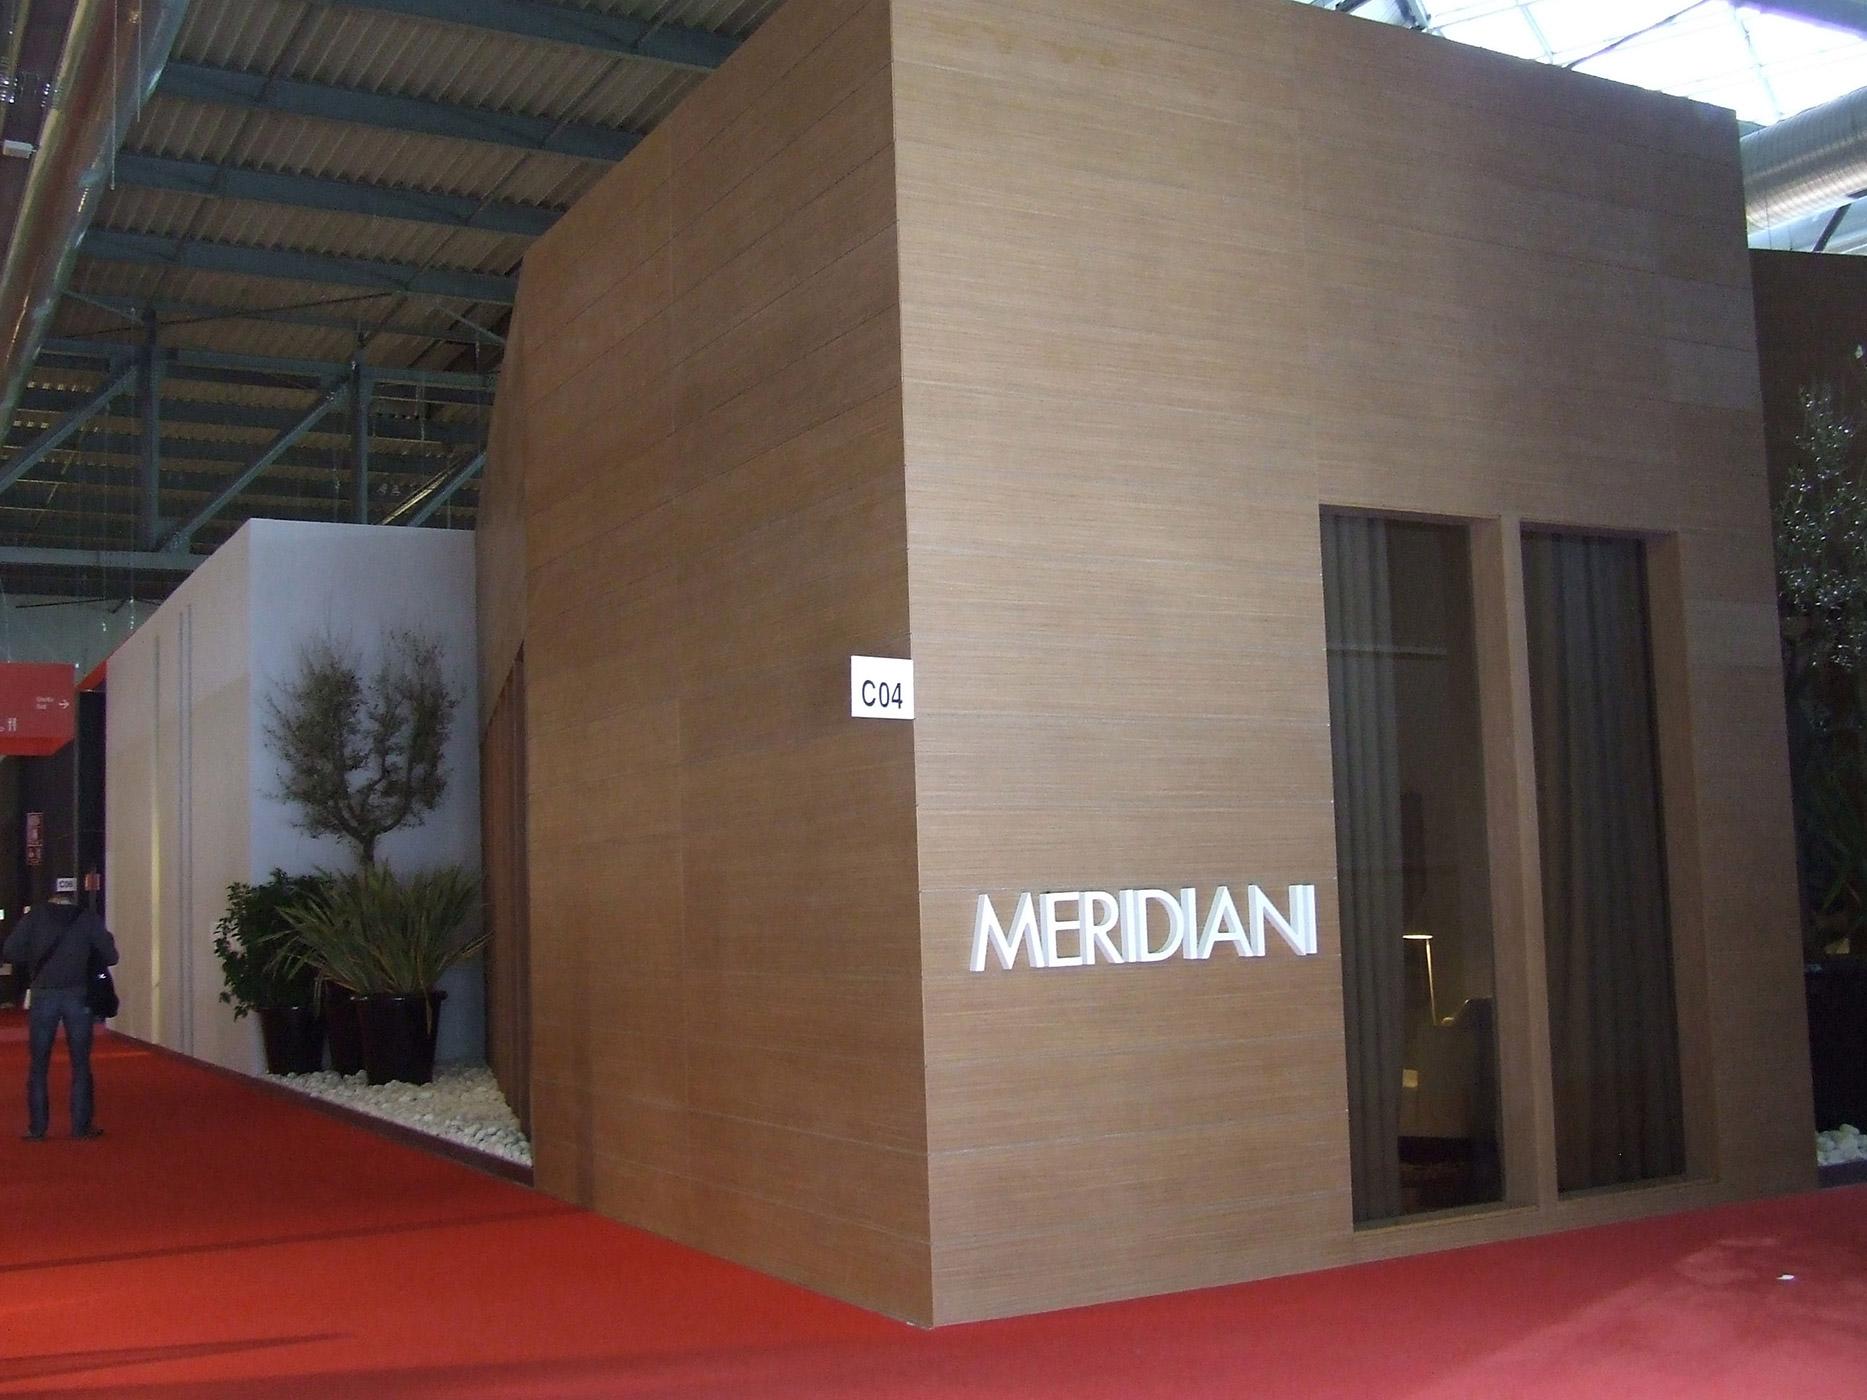 3-Meridiani-Salone-2010